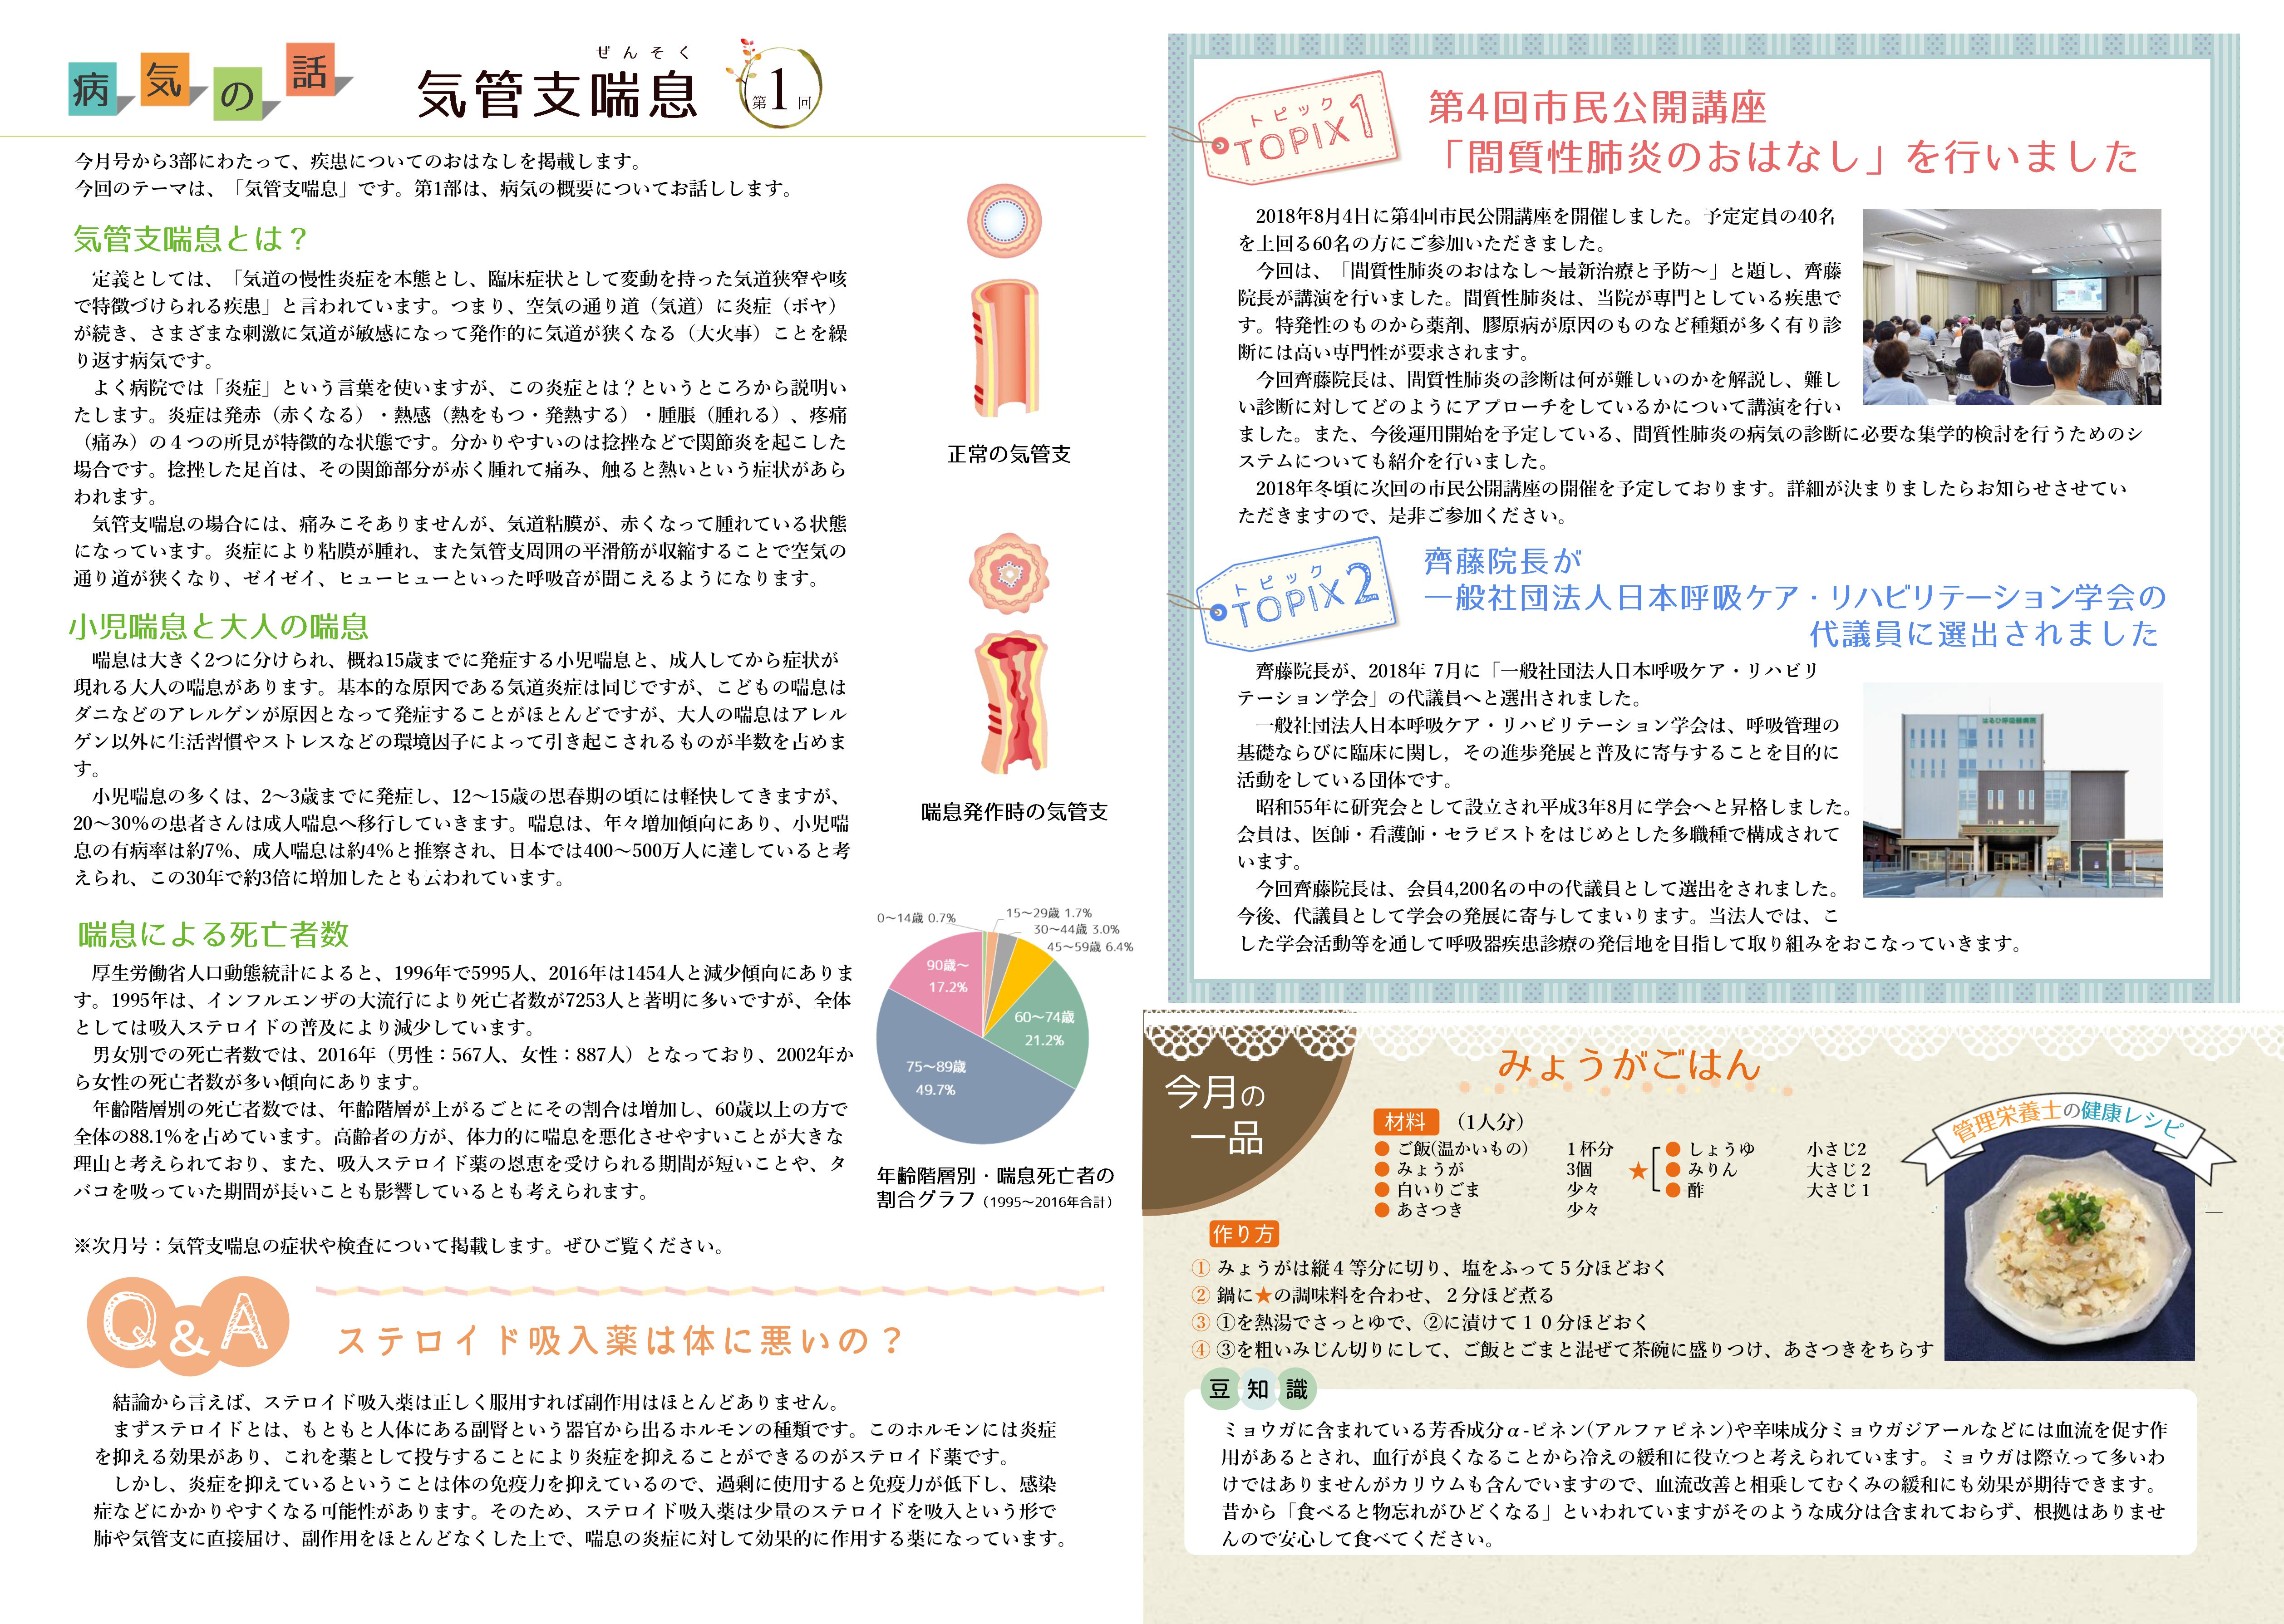 201809清須の息吹_気管支喘息1-2